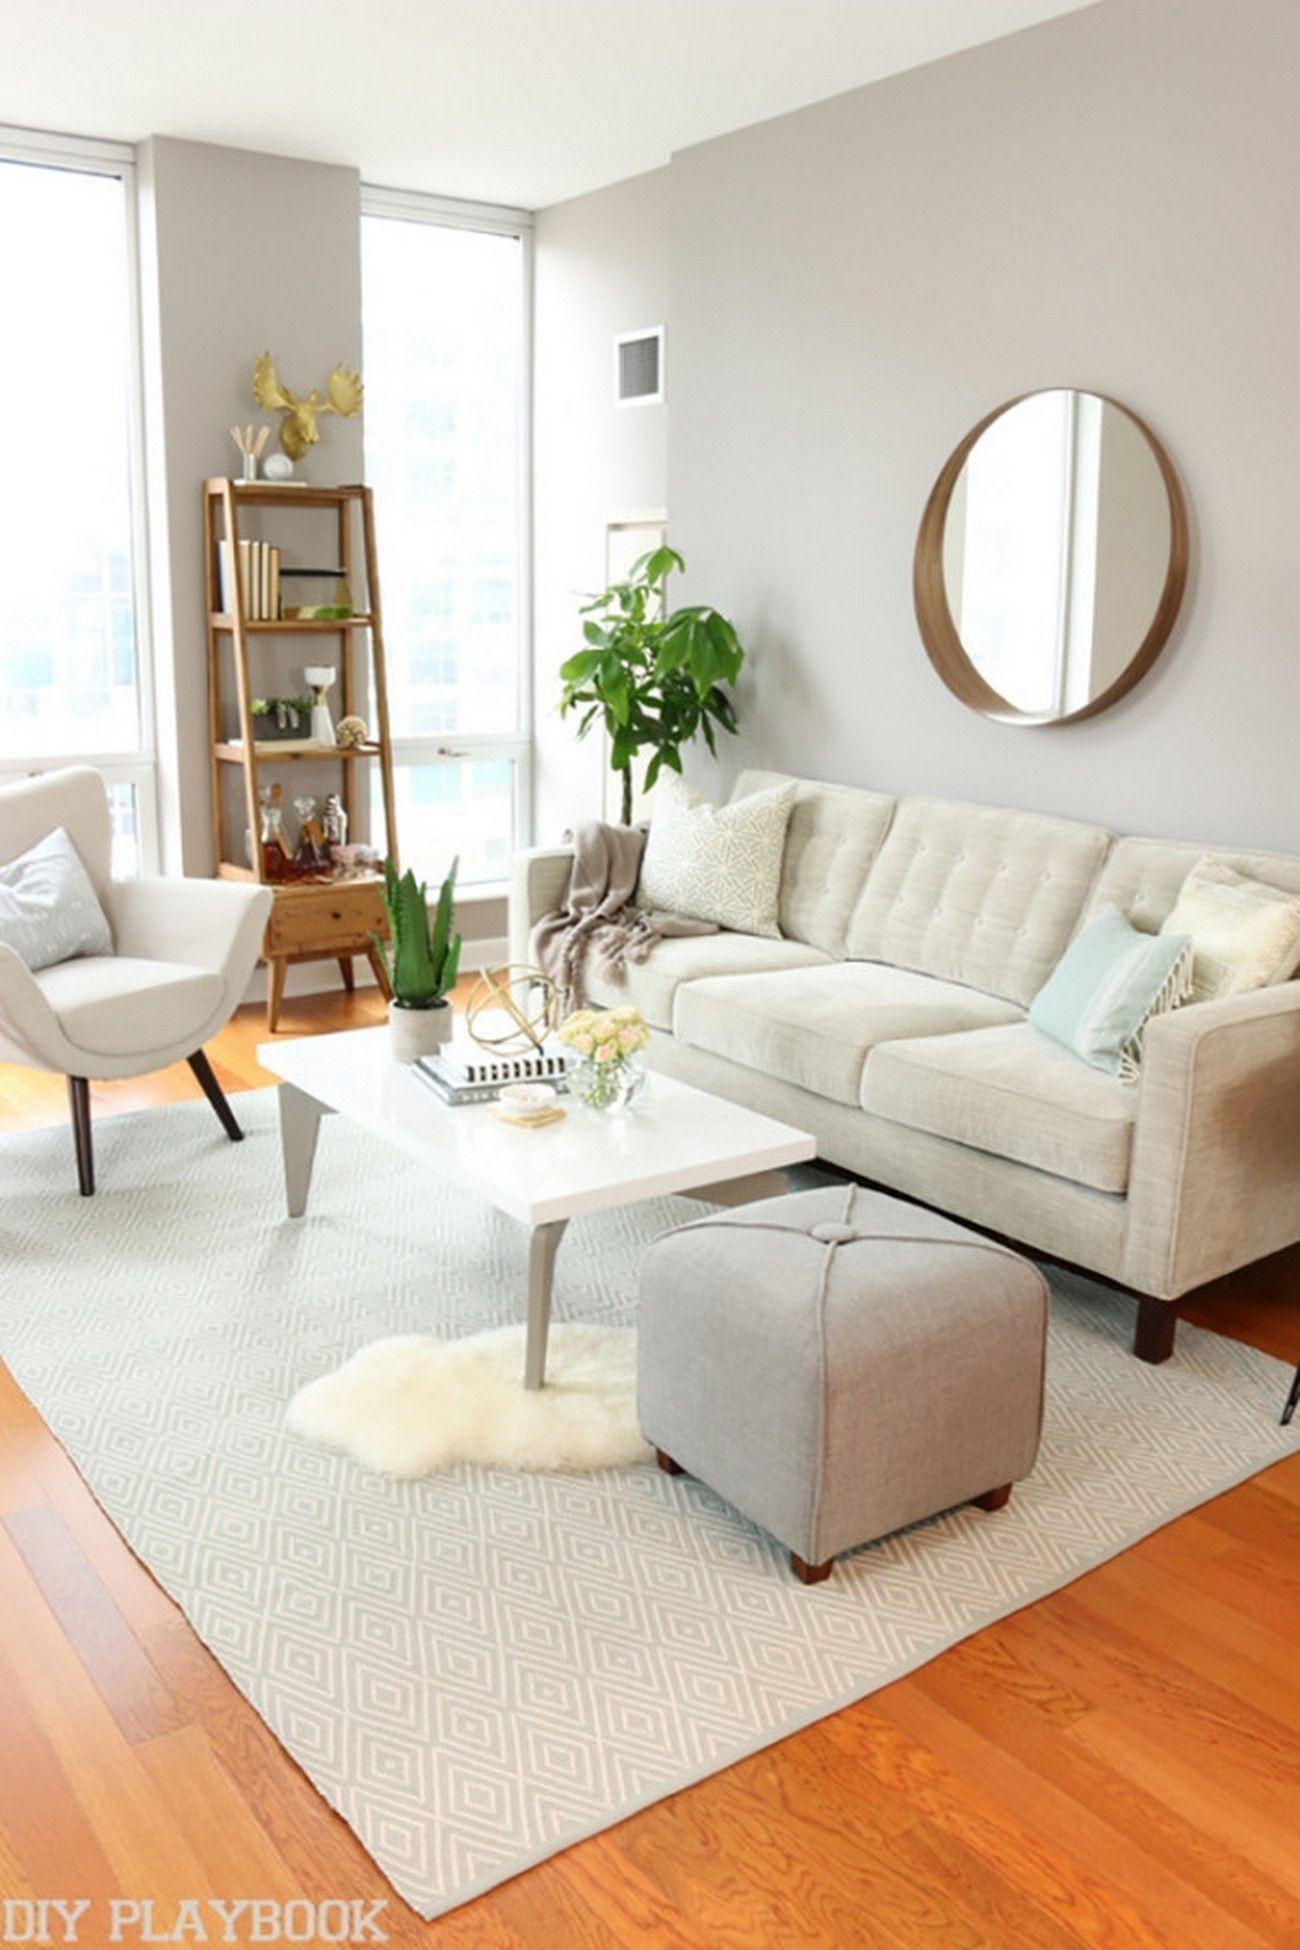 Amazing 36 Minimalist Living Room Design Ideas Http Homiku Com Index Php 2018 In 2020 Living Room Decor Apartment Small Apartment Living Room Minimalist Living Room